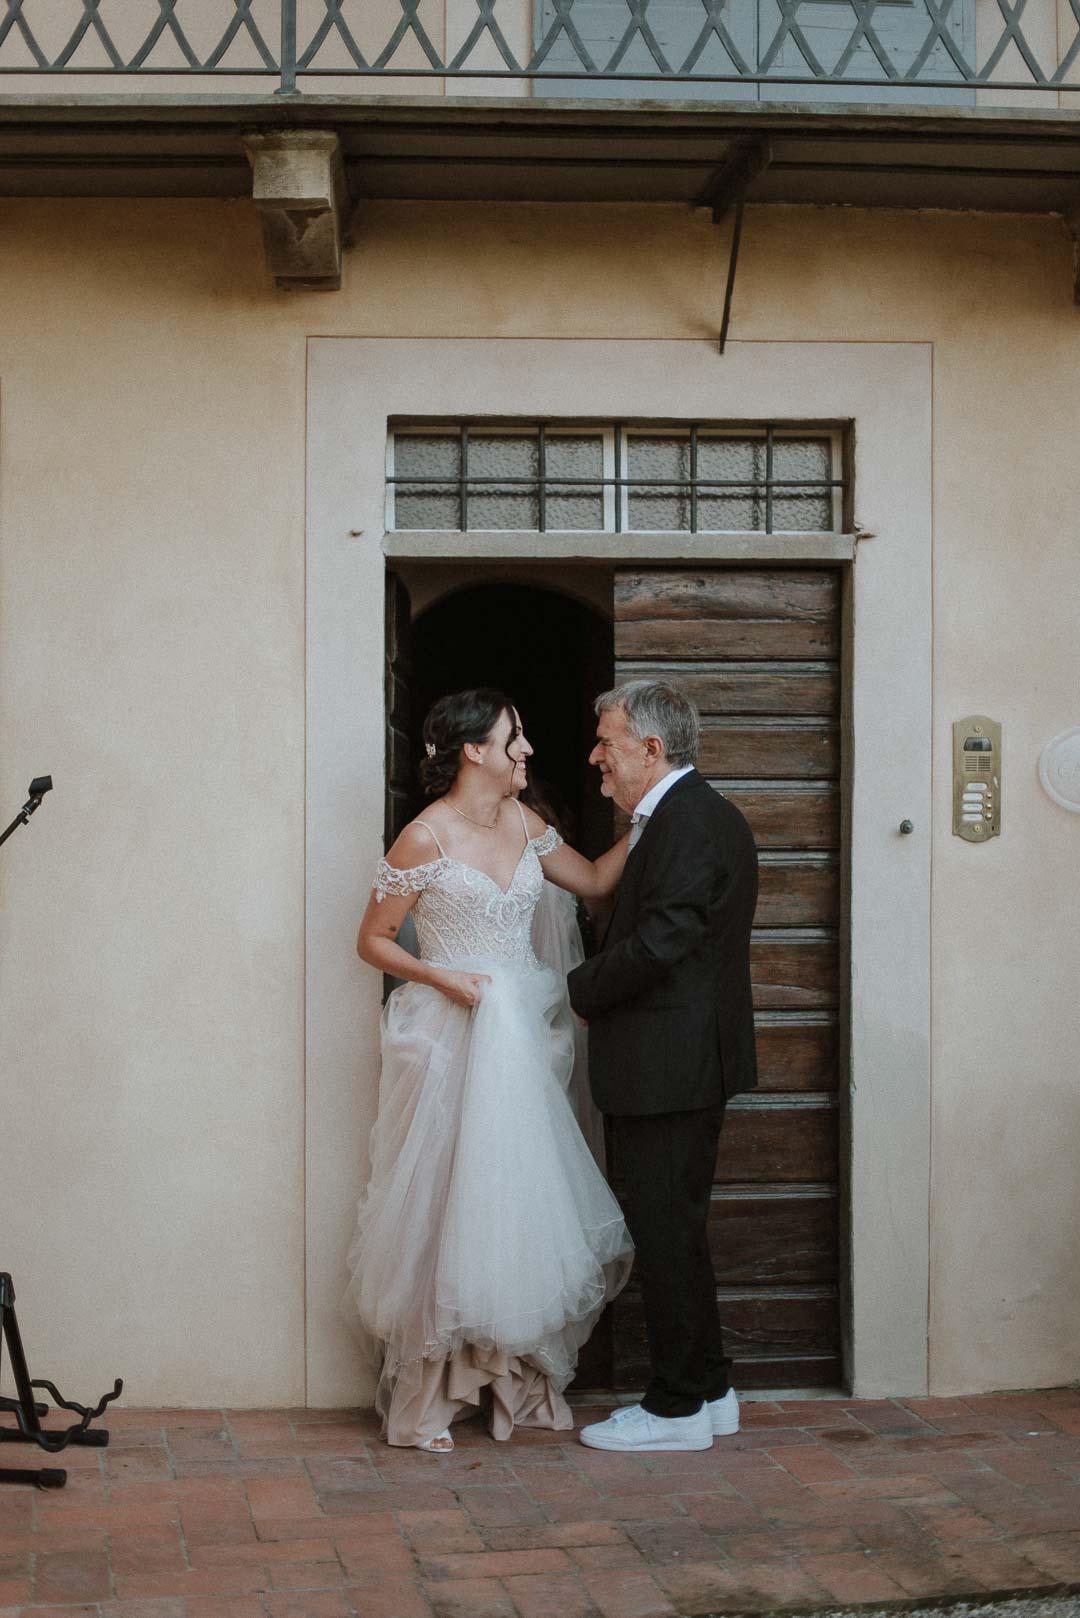 wedding-photographer-destination-fineart-bespoke-reportage-tuscany-villascorzi-vivianeizzo-spazio46-60